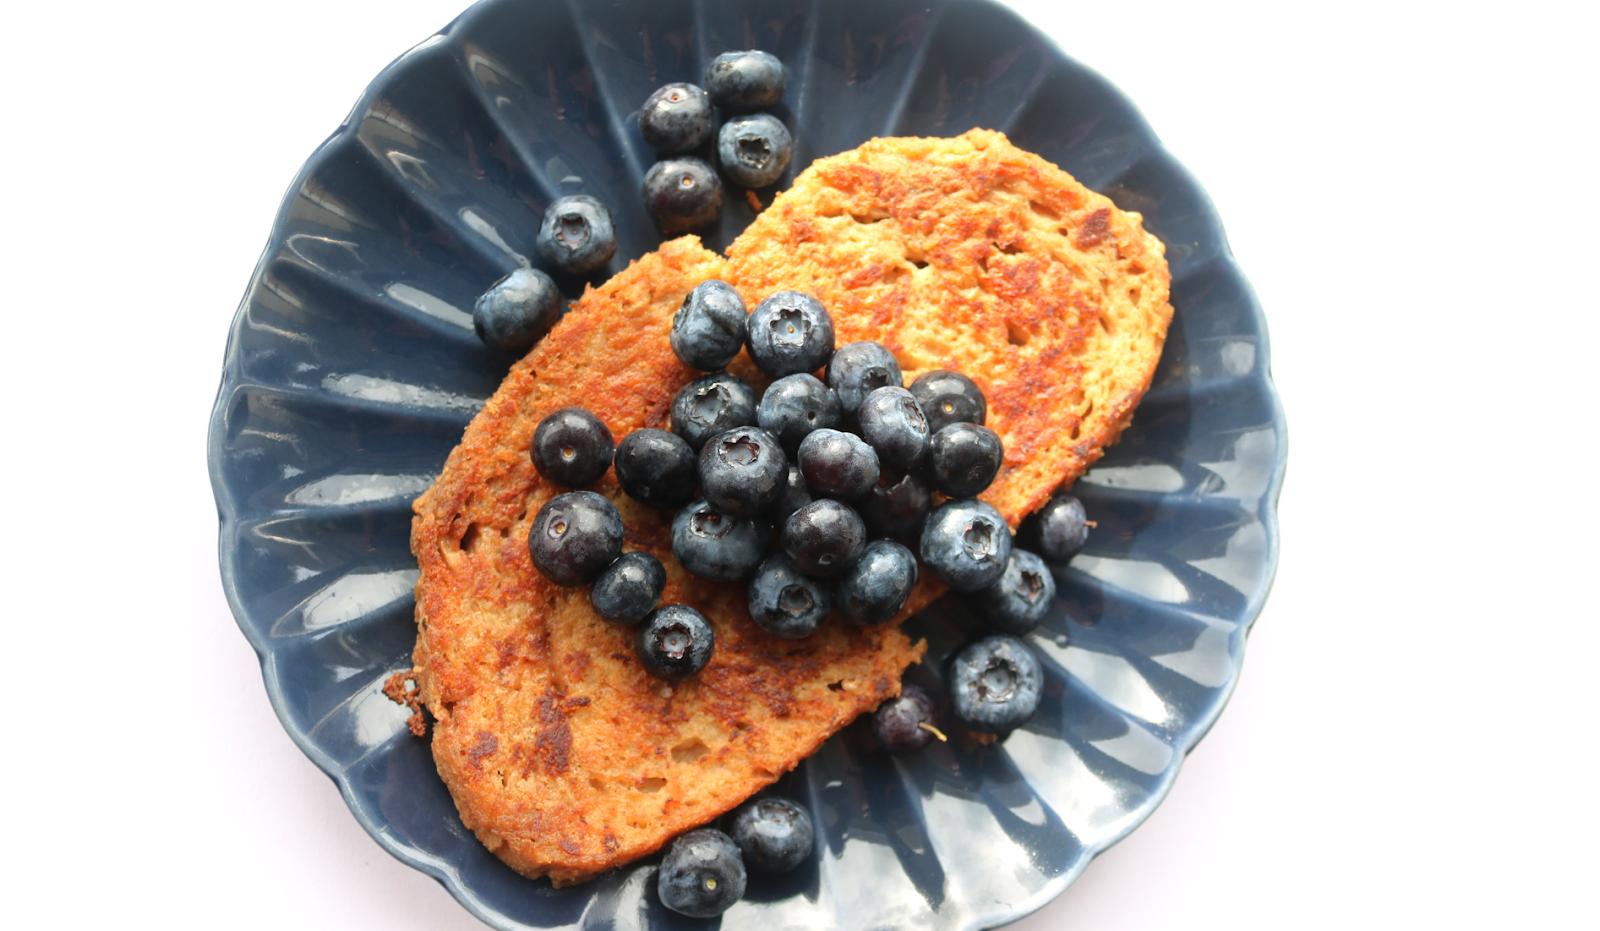 Vegan French Toast recipe